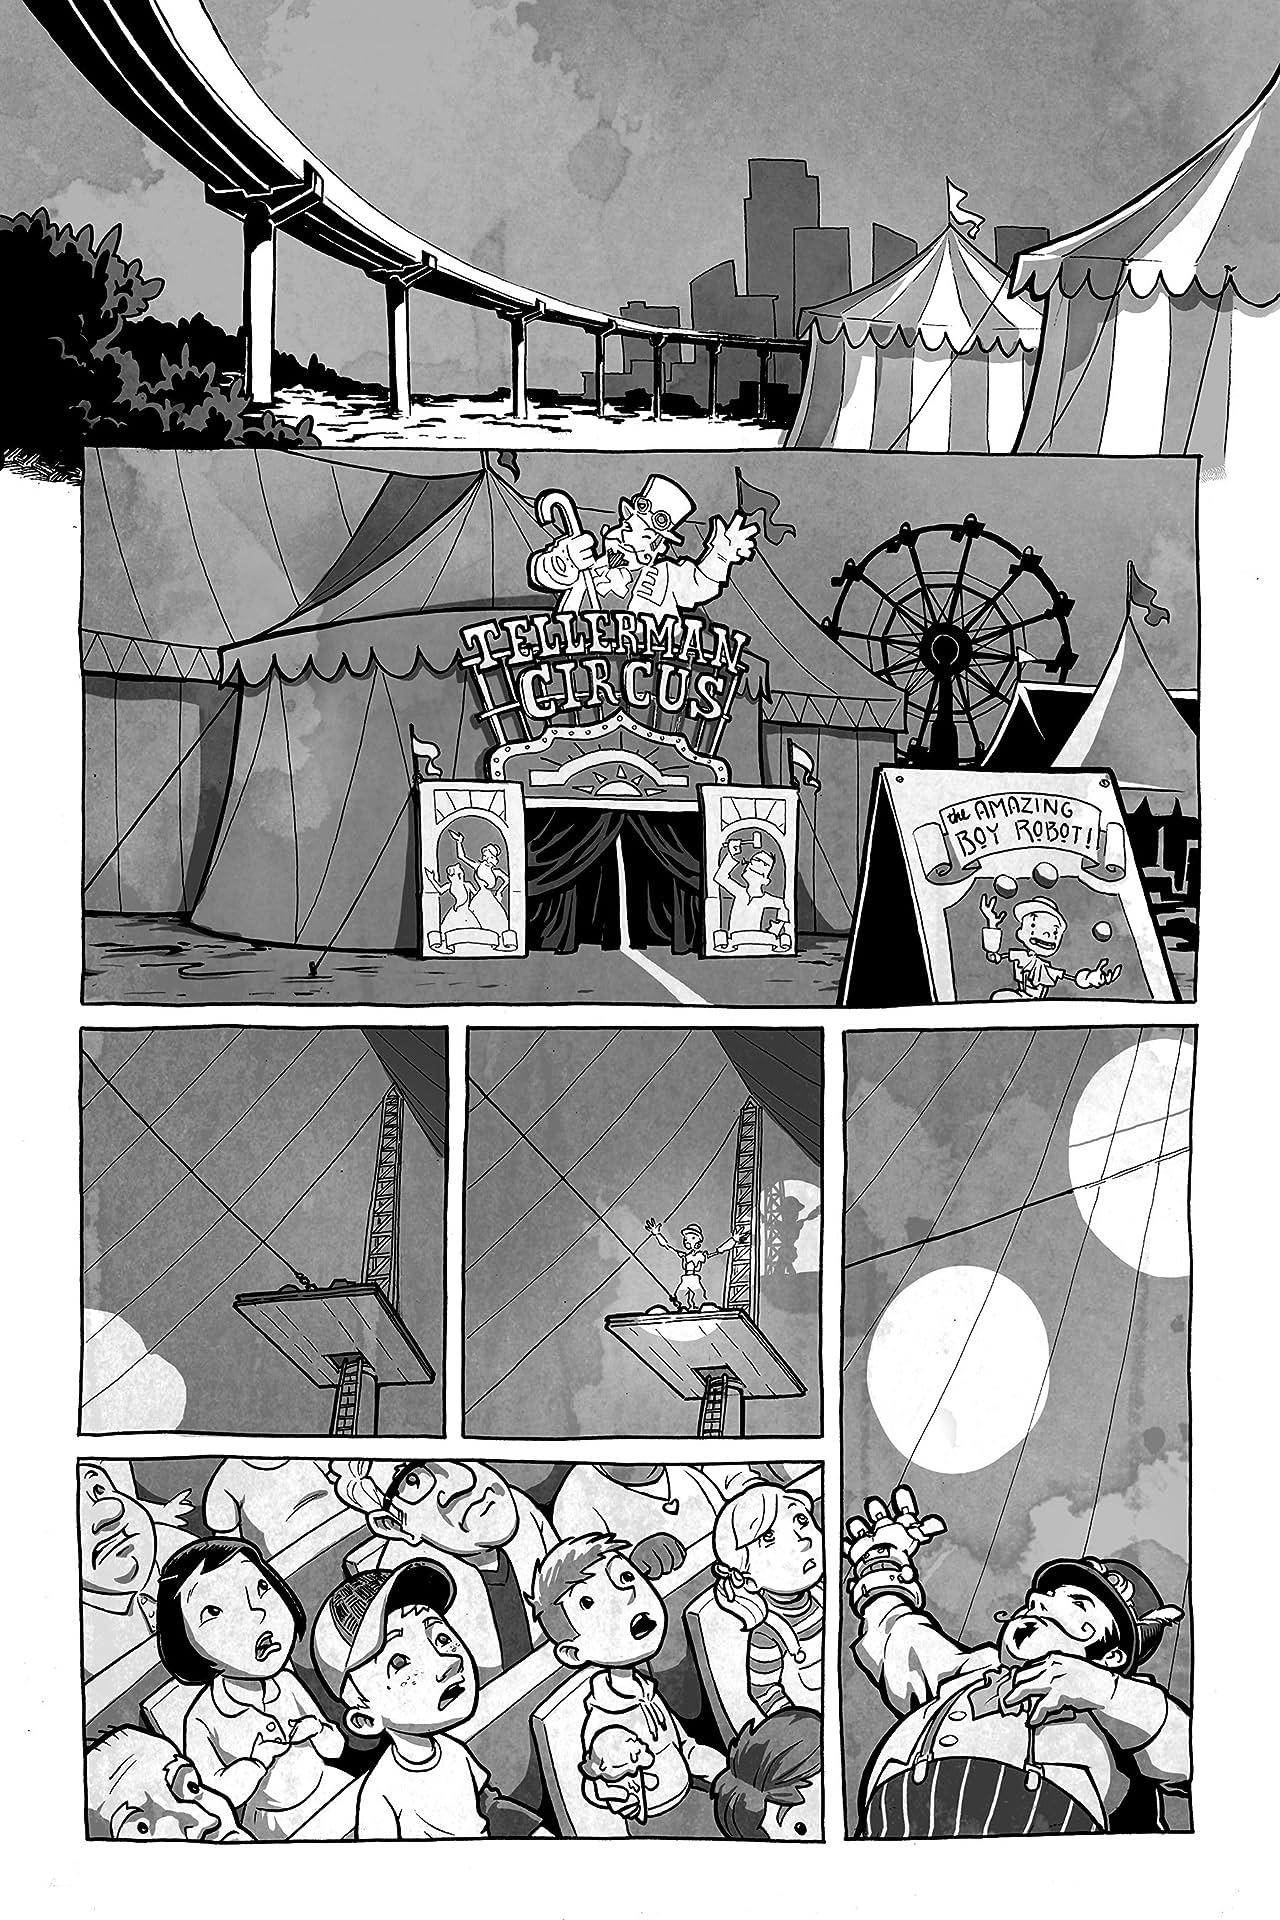 The Sunless Circus #1